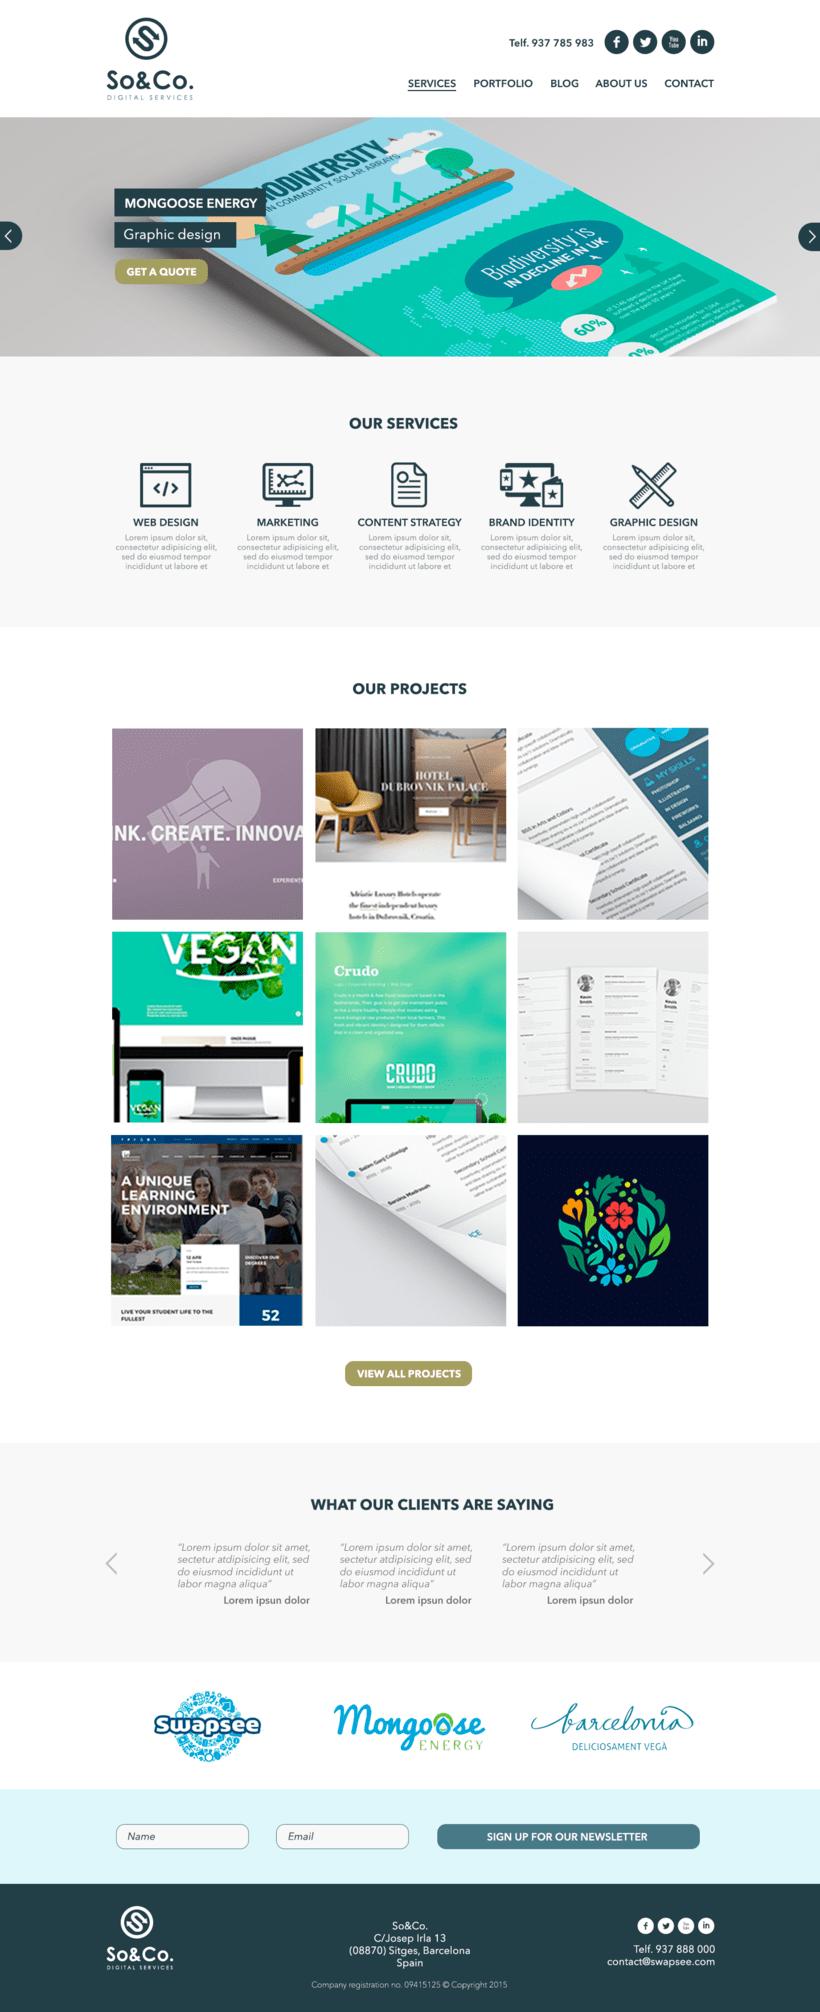 Diseño Web/UI/UX: So&Co Digital Services 1